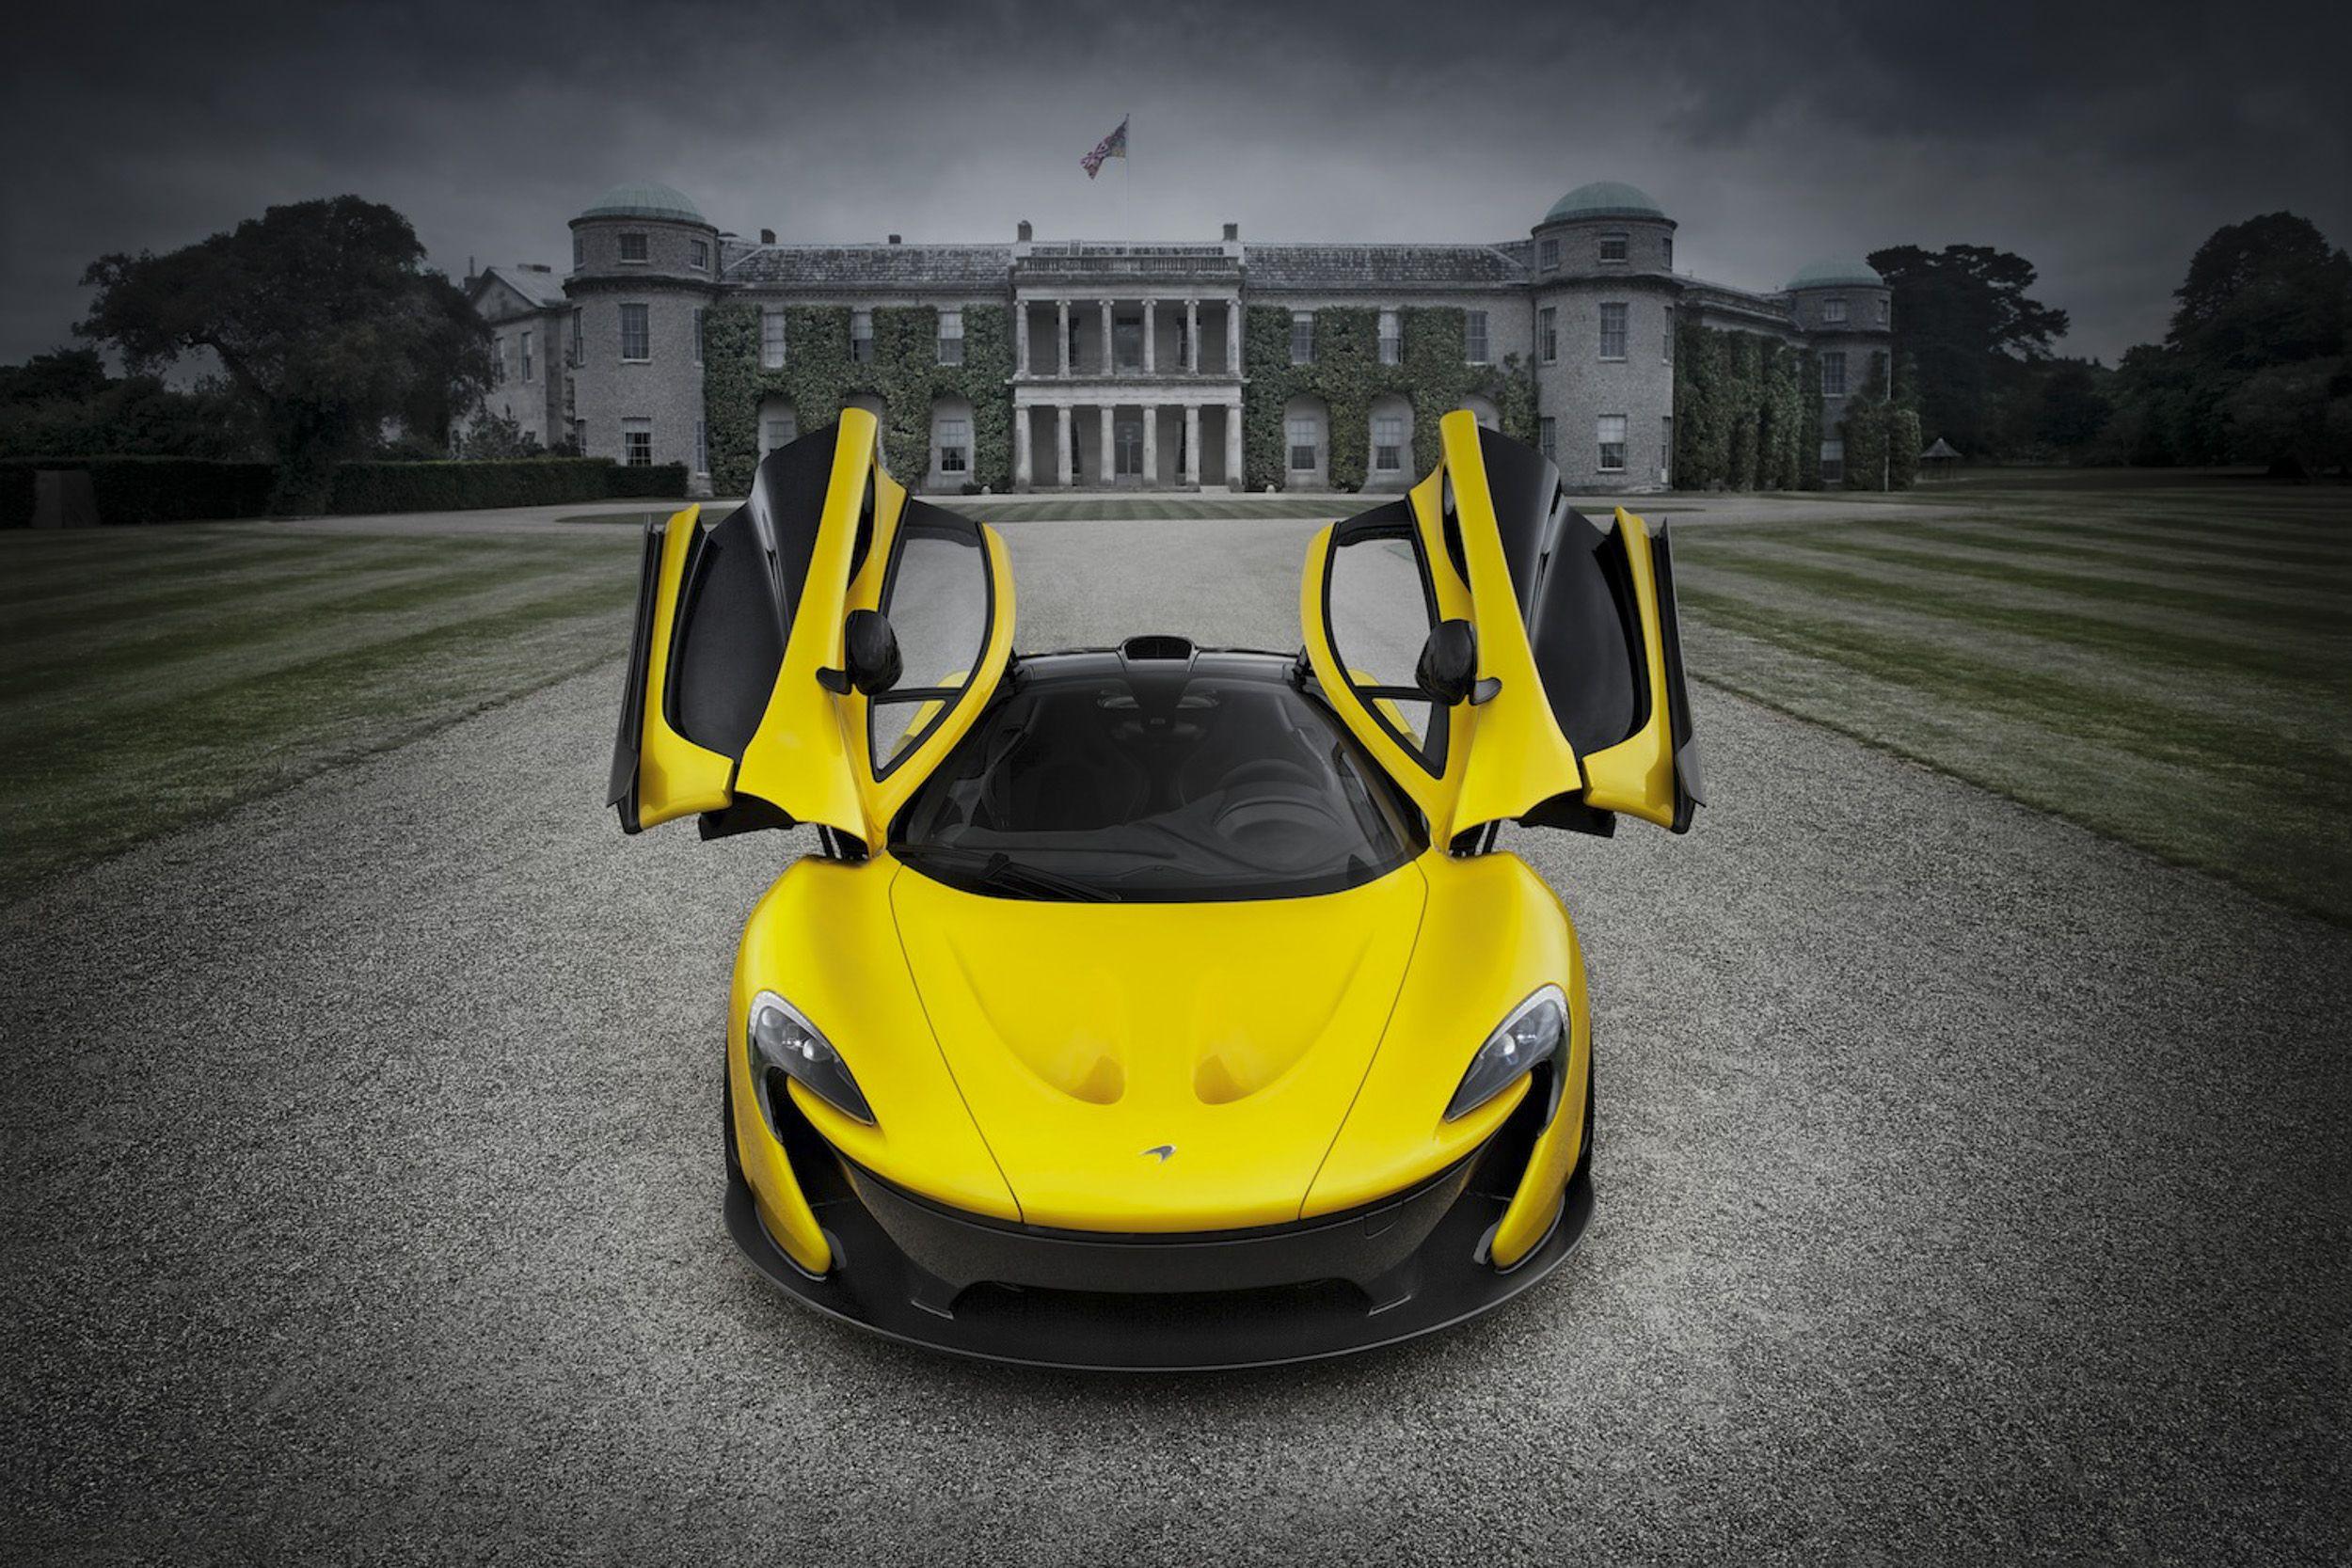 McLaren P1 In Yellow On Cool Hd Wallpaper Mclarenp1 Cars Hdwallpaper HD